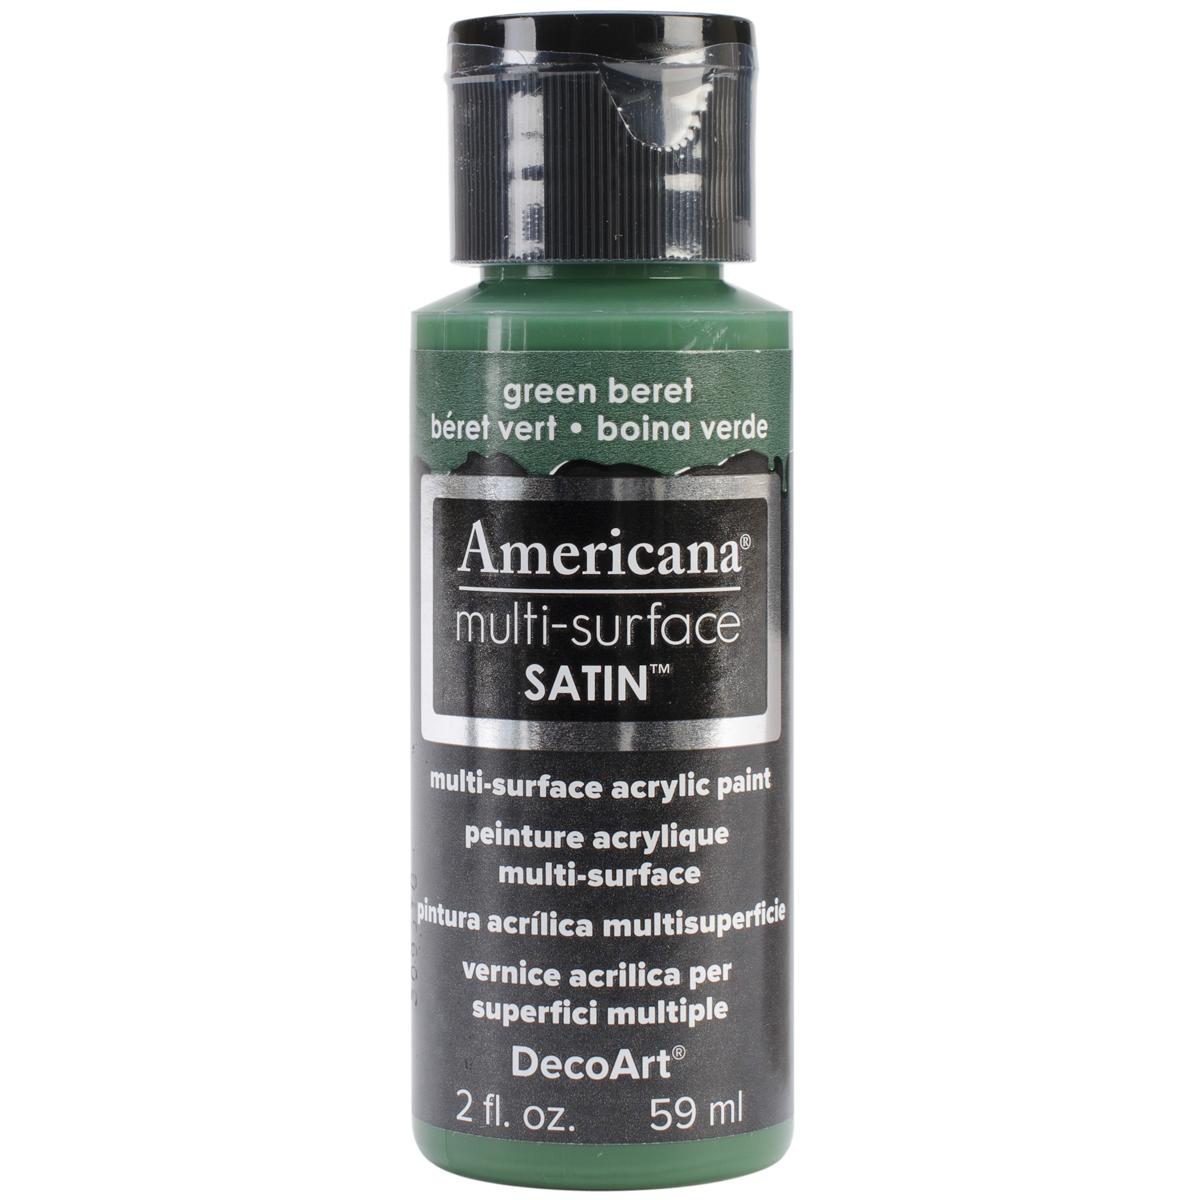 Americana Multi-Surface Satin Acrylic Paint 2oz-Green Beret